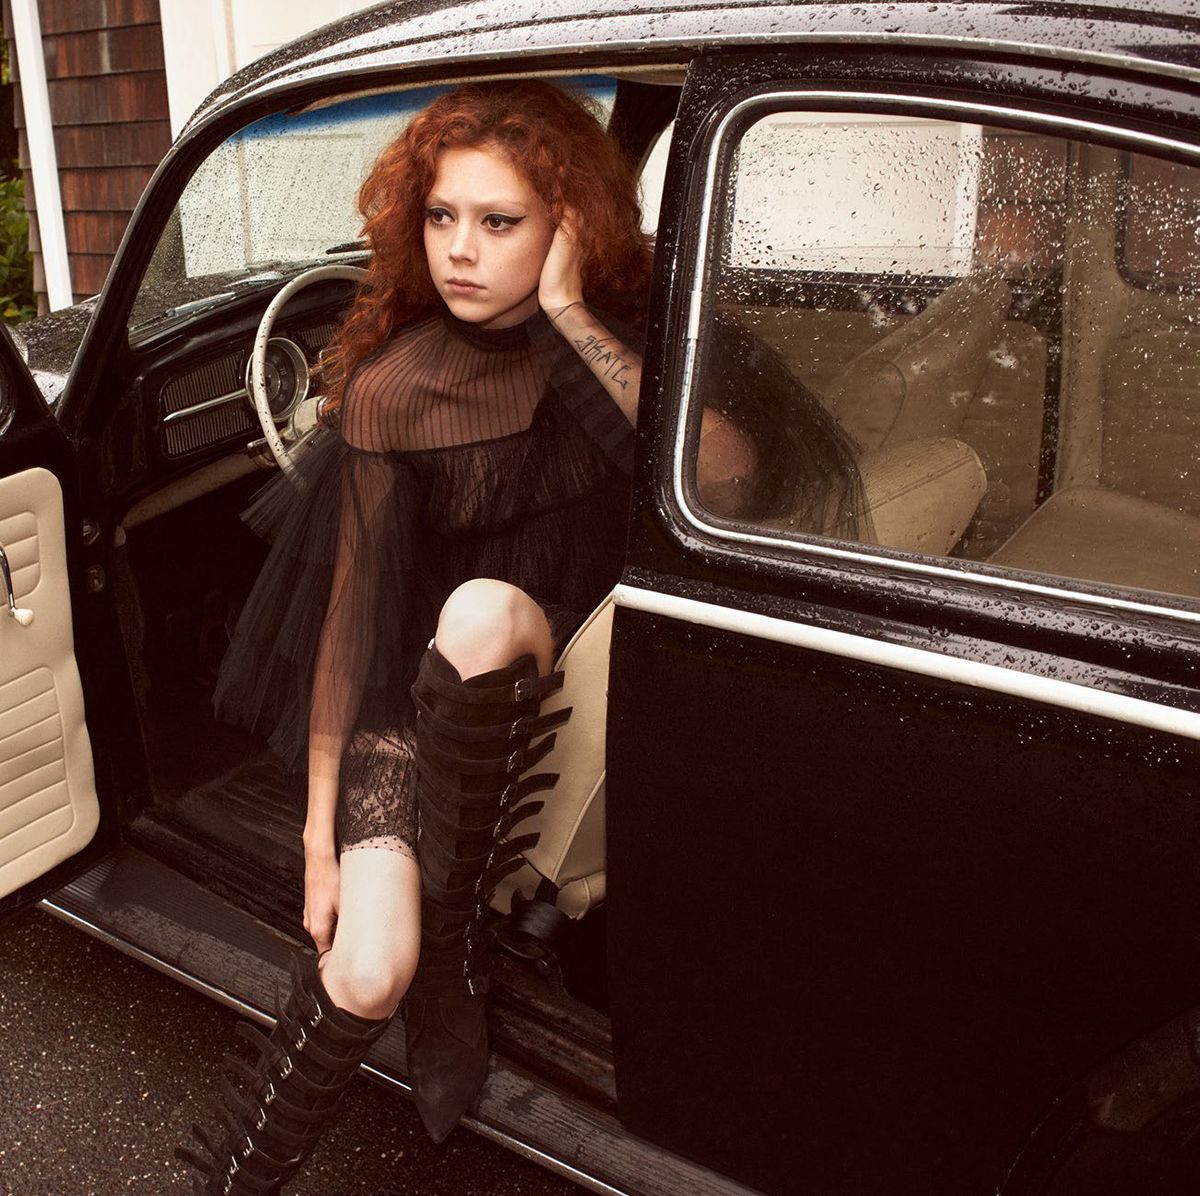 Natalie Westling See-Through photos